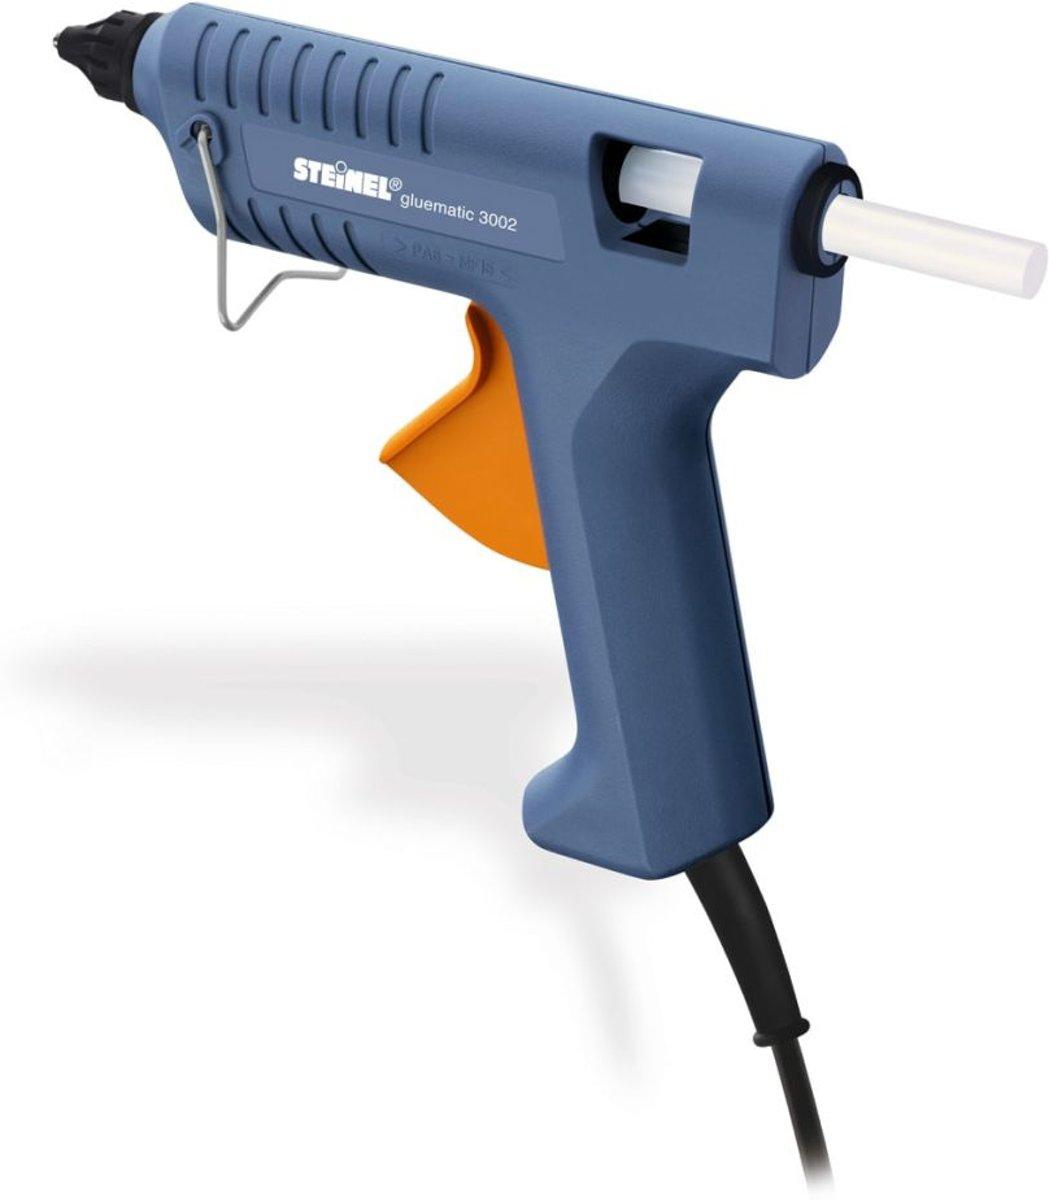 Steinel Lijmpistool Gluematic 3002 - Incl. 3 lijmpatronen - 40W - 333317 kopen